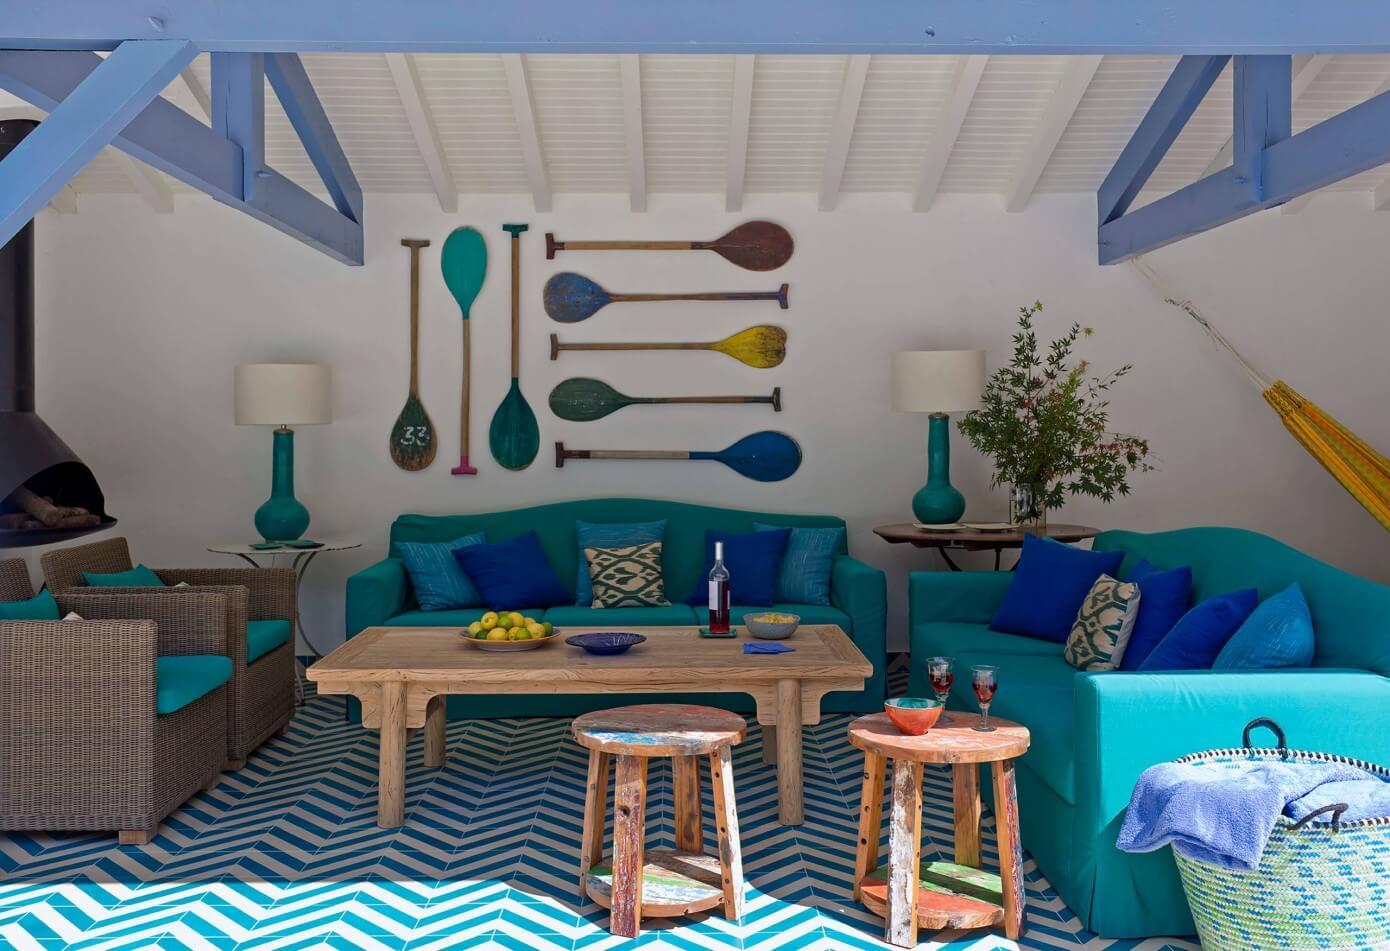 Biarritz Residence by Melian Randolph